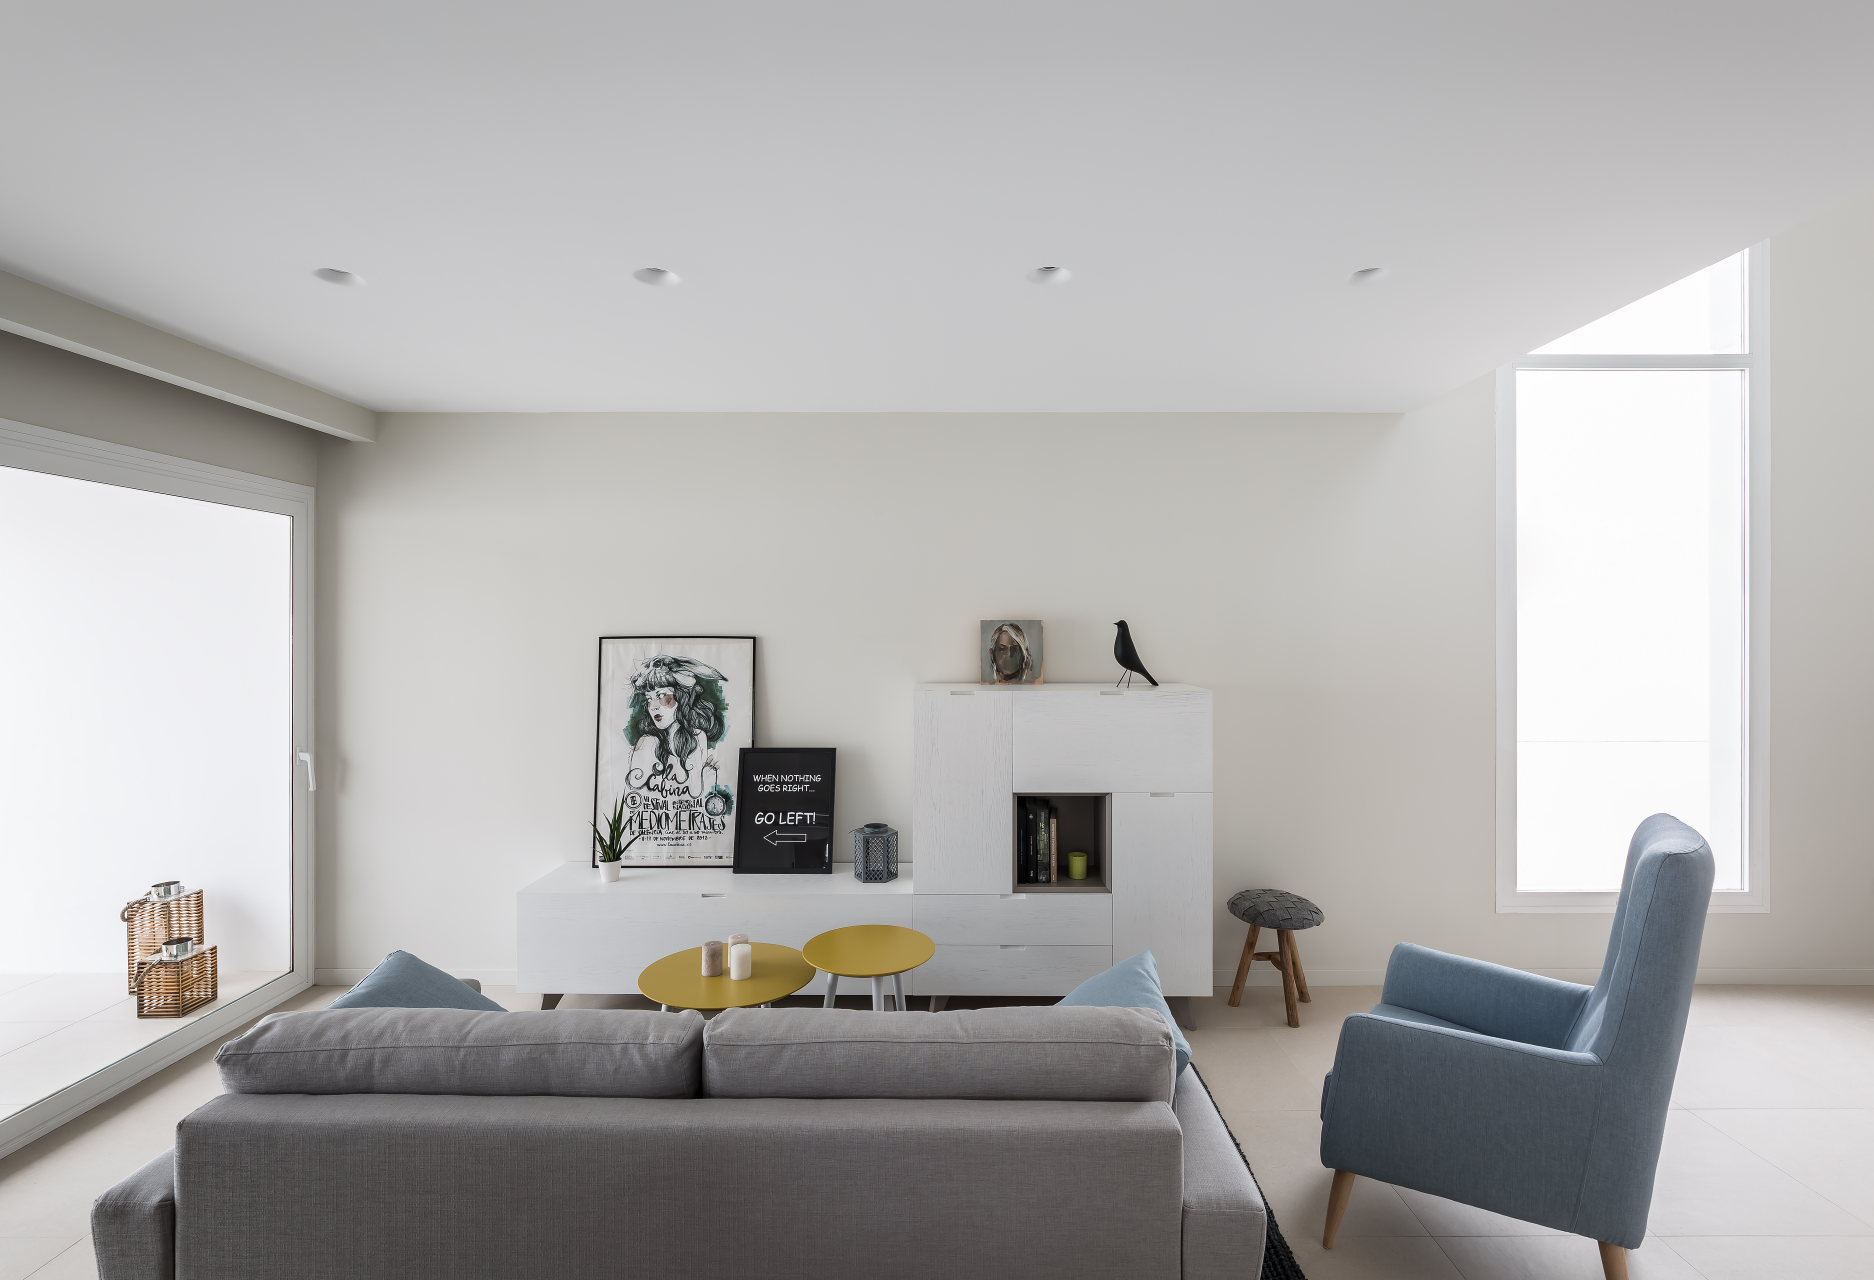 fotografia-arquitectura-valencia-german-cabo-viraje-san-antonio (14)